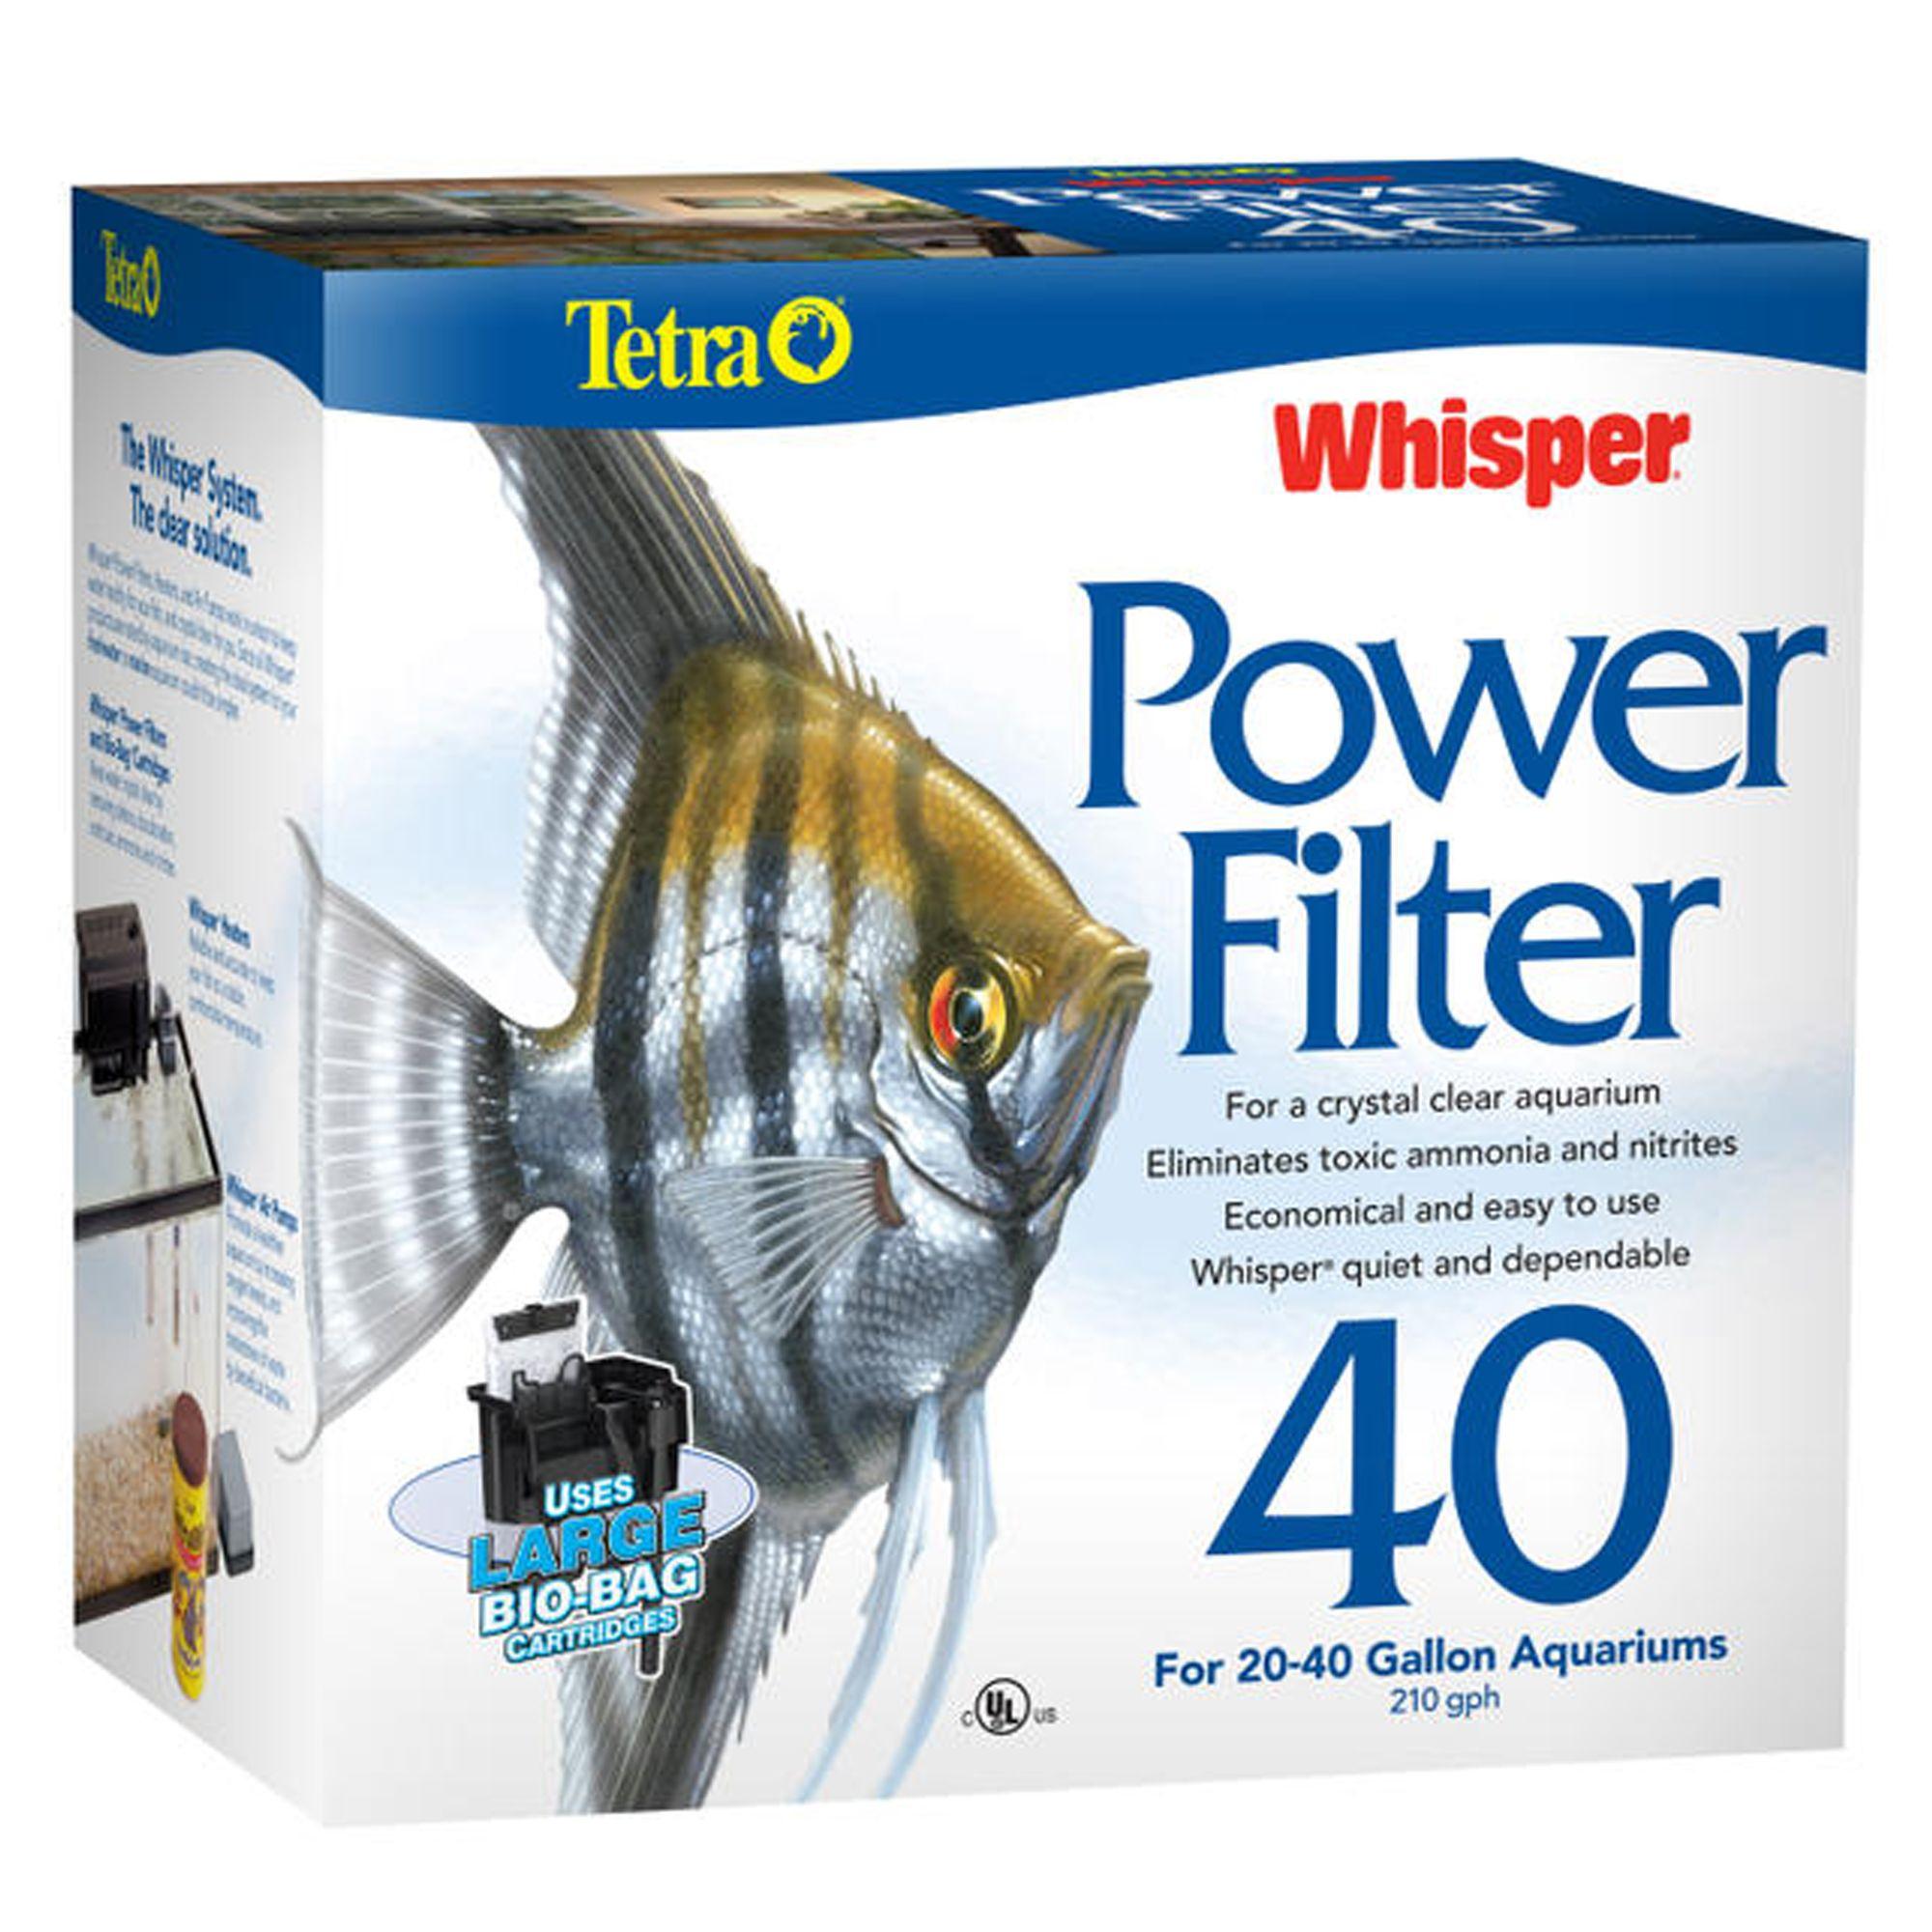 Tetra® Whisper Power Filter size: 40 Gal 1833535